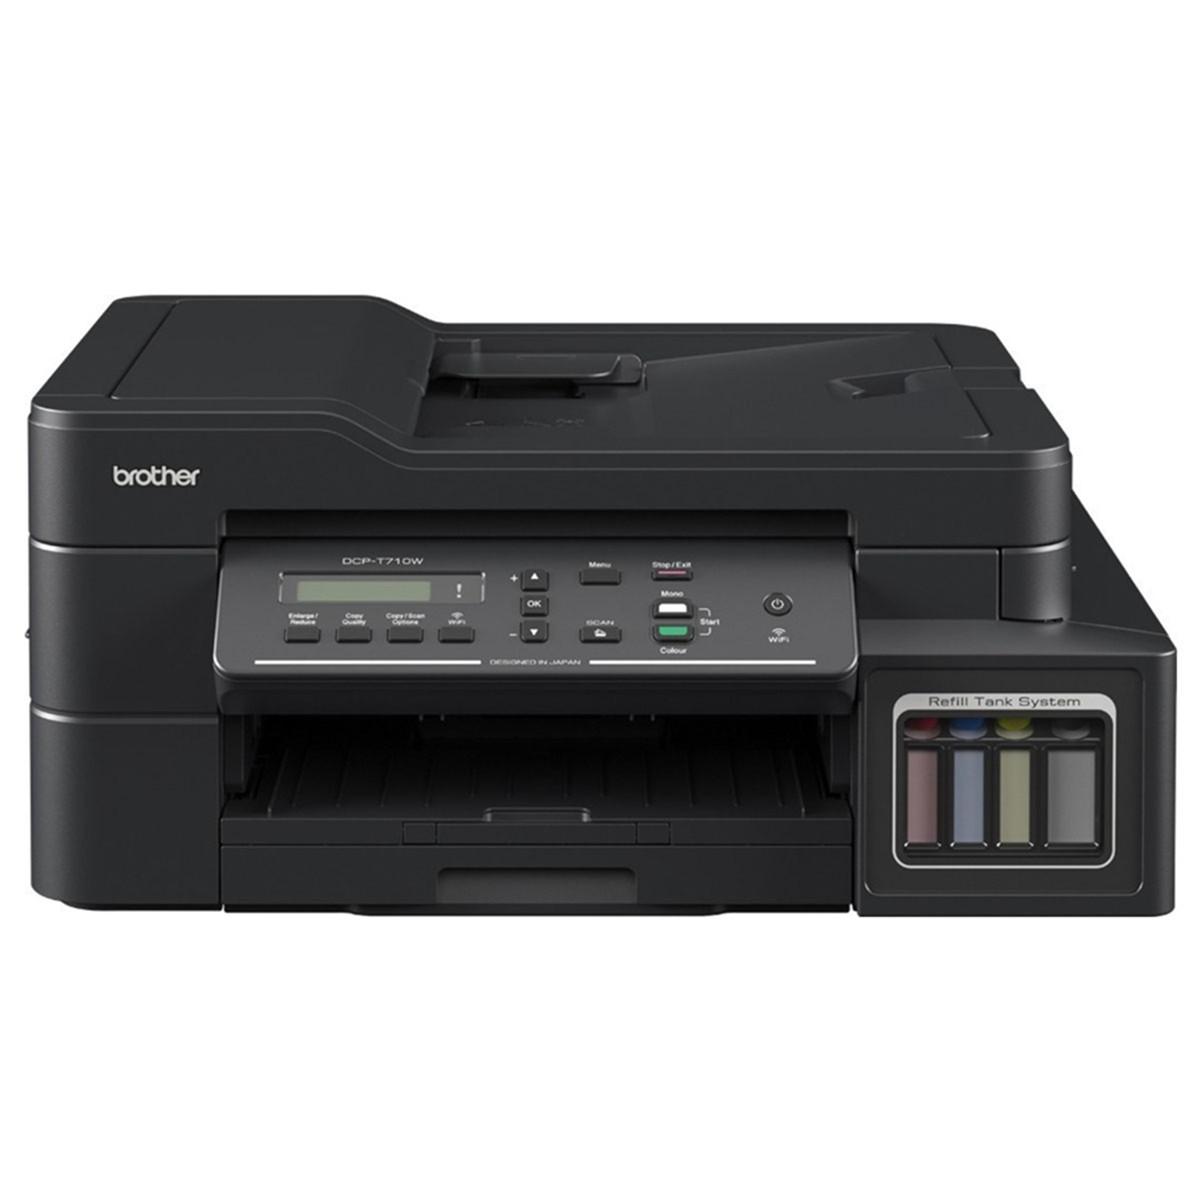 Impressora Brother DCP-T710W DCP-T710 Multifuncional Tanque de Tinta Colorida com Wireless